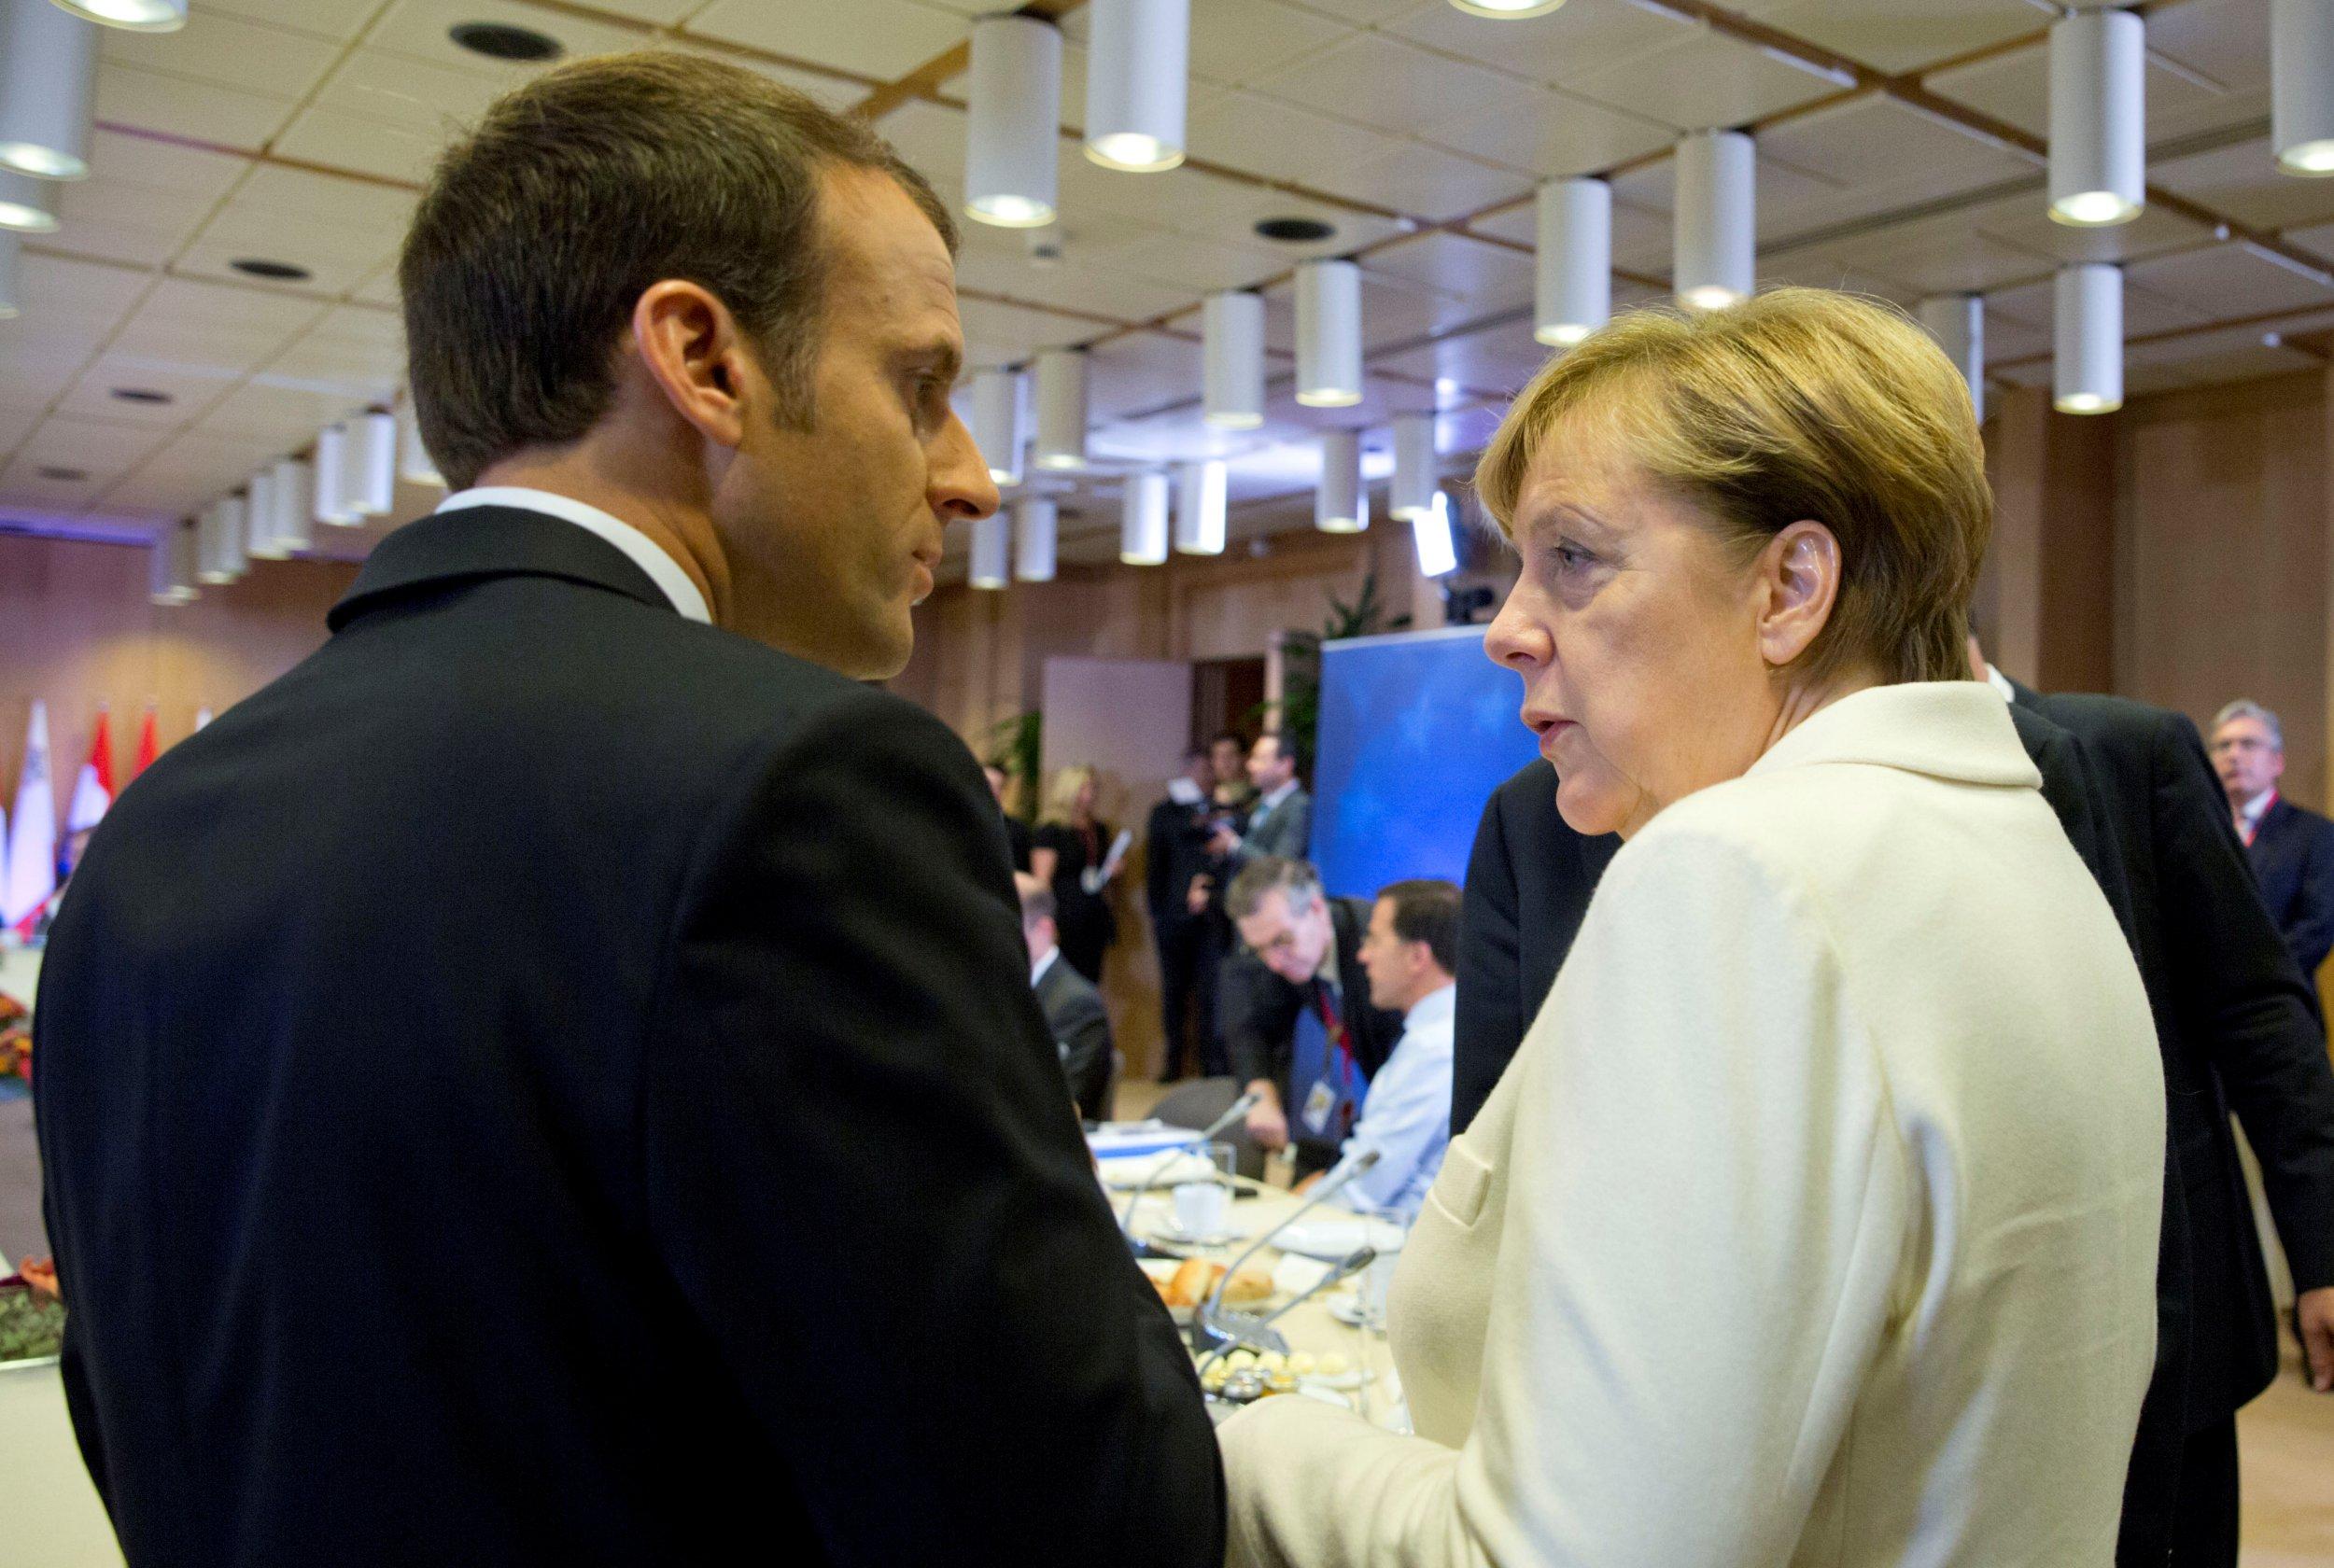 11_15_Angela_Merkel_Emmanuel_Macron